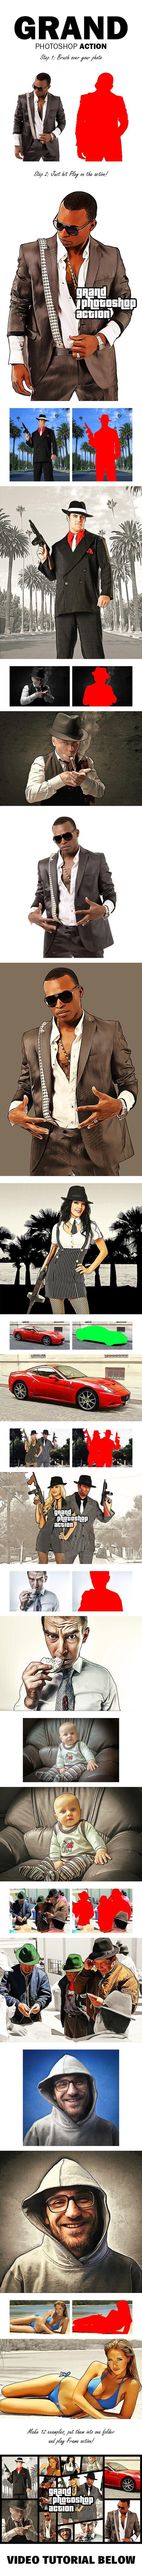 Grand Photoshop Action #photoeffect Download: http://graphicriver.net/item/grand-photoshop-action/11341606?ref=ksioks